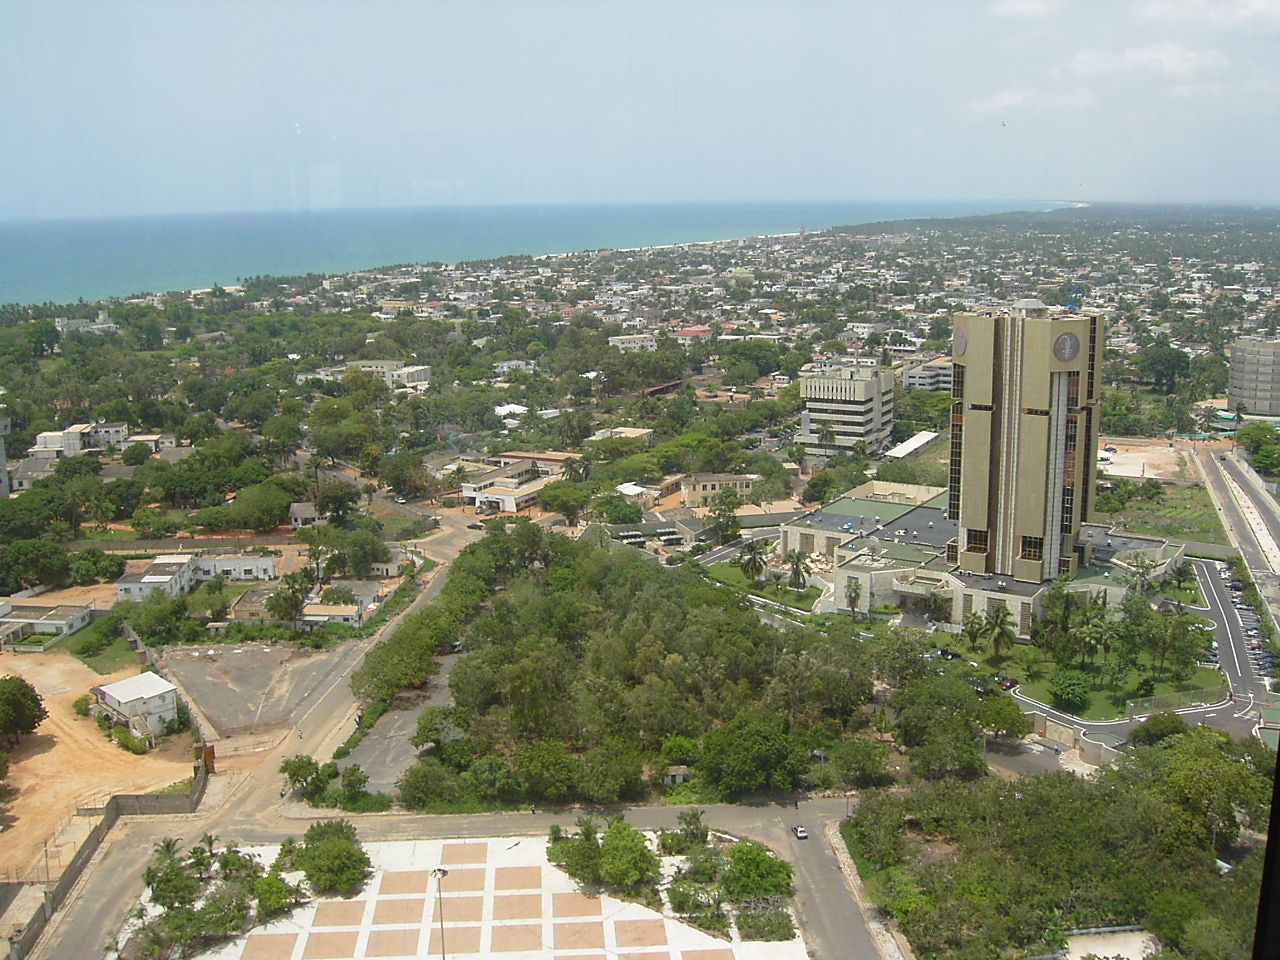 File:Quartier des administrations (Lomé, Togo).jpg - Wikimedia Commons